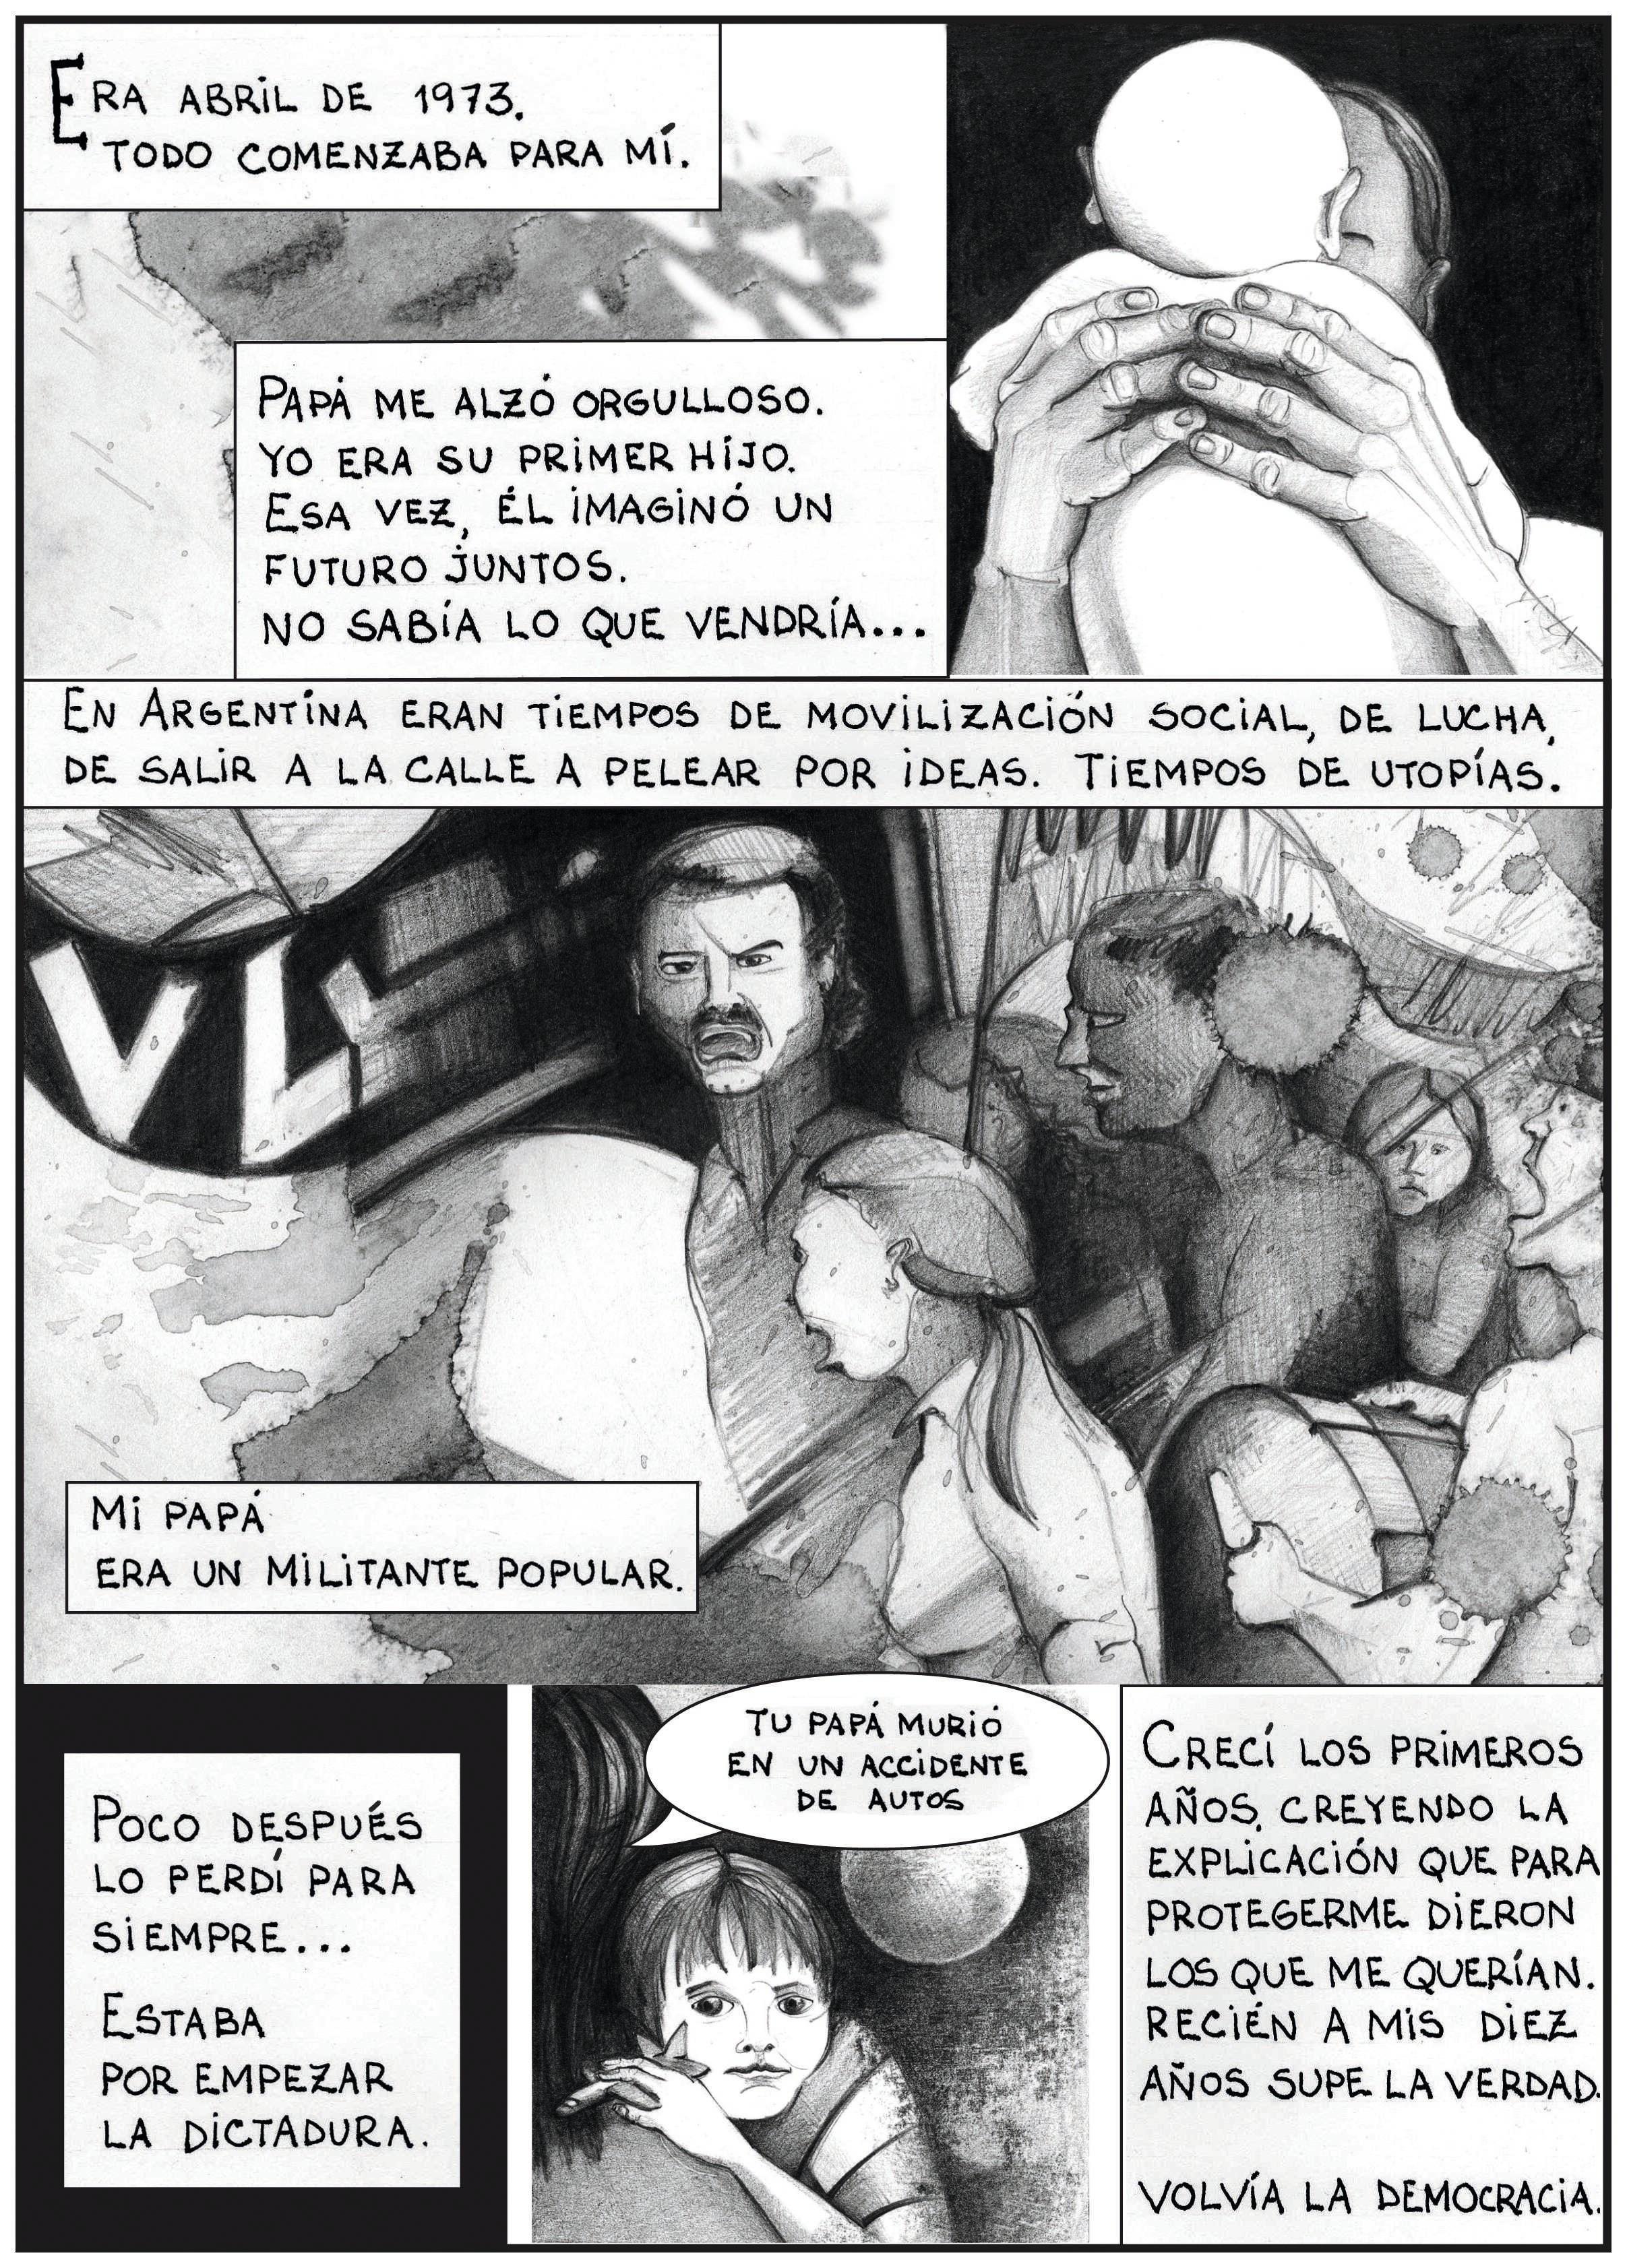 Marcelo Gómez, Historietas por la identidad 1